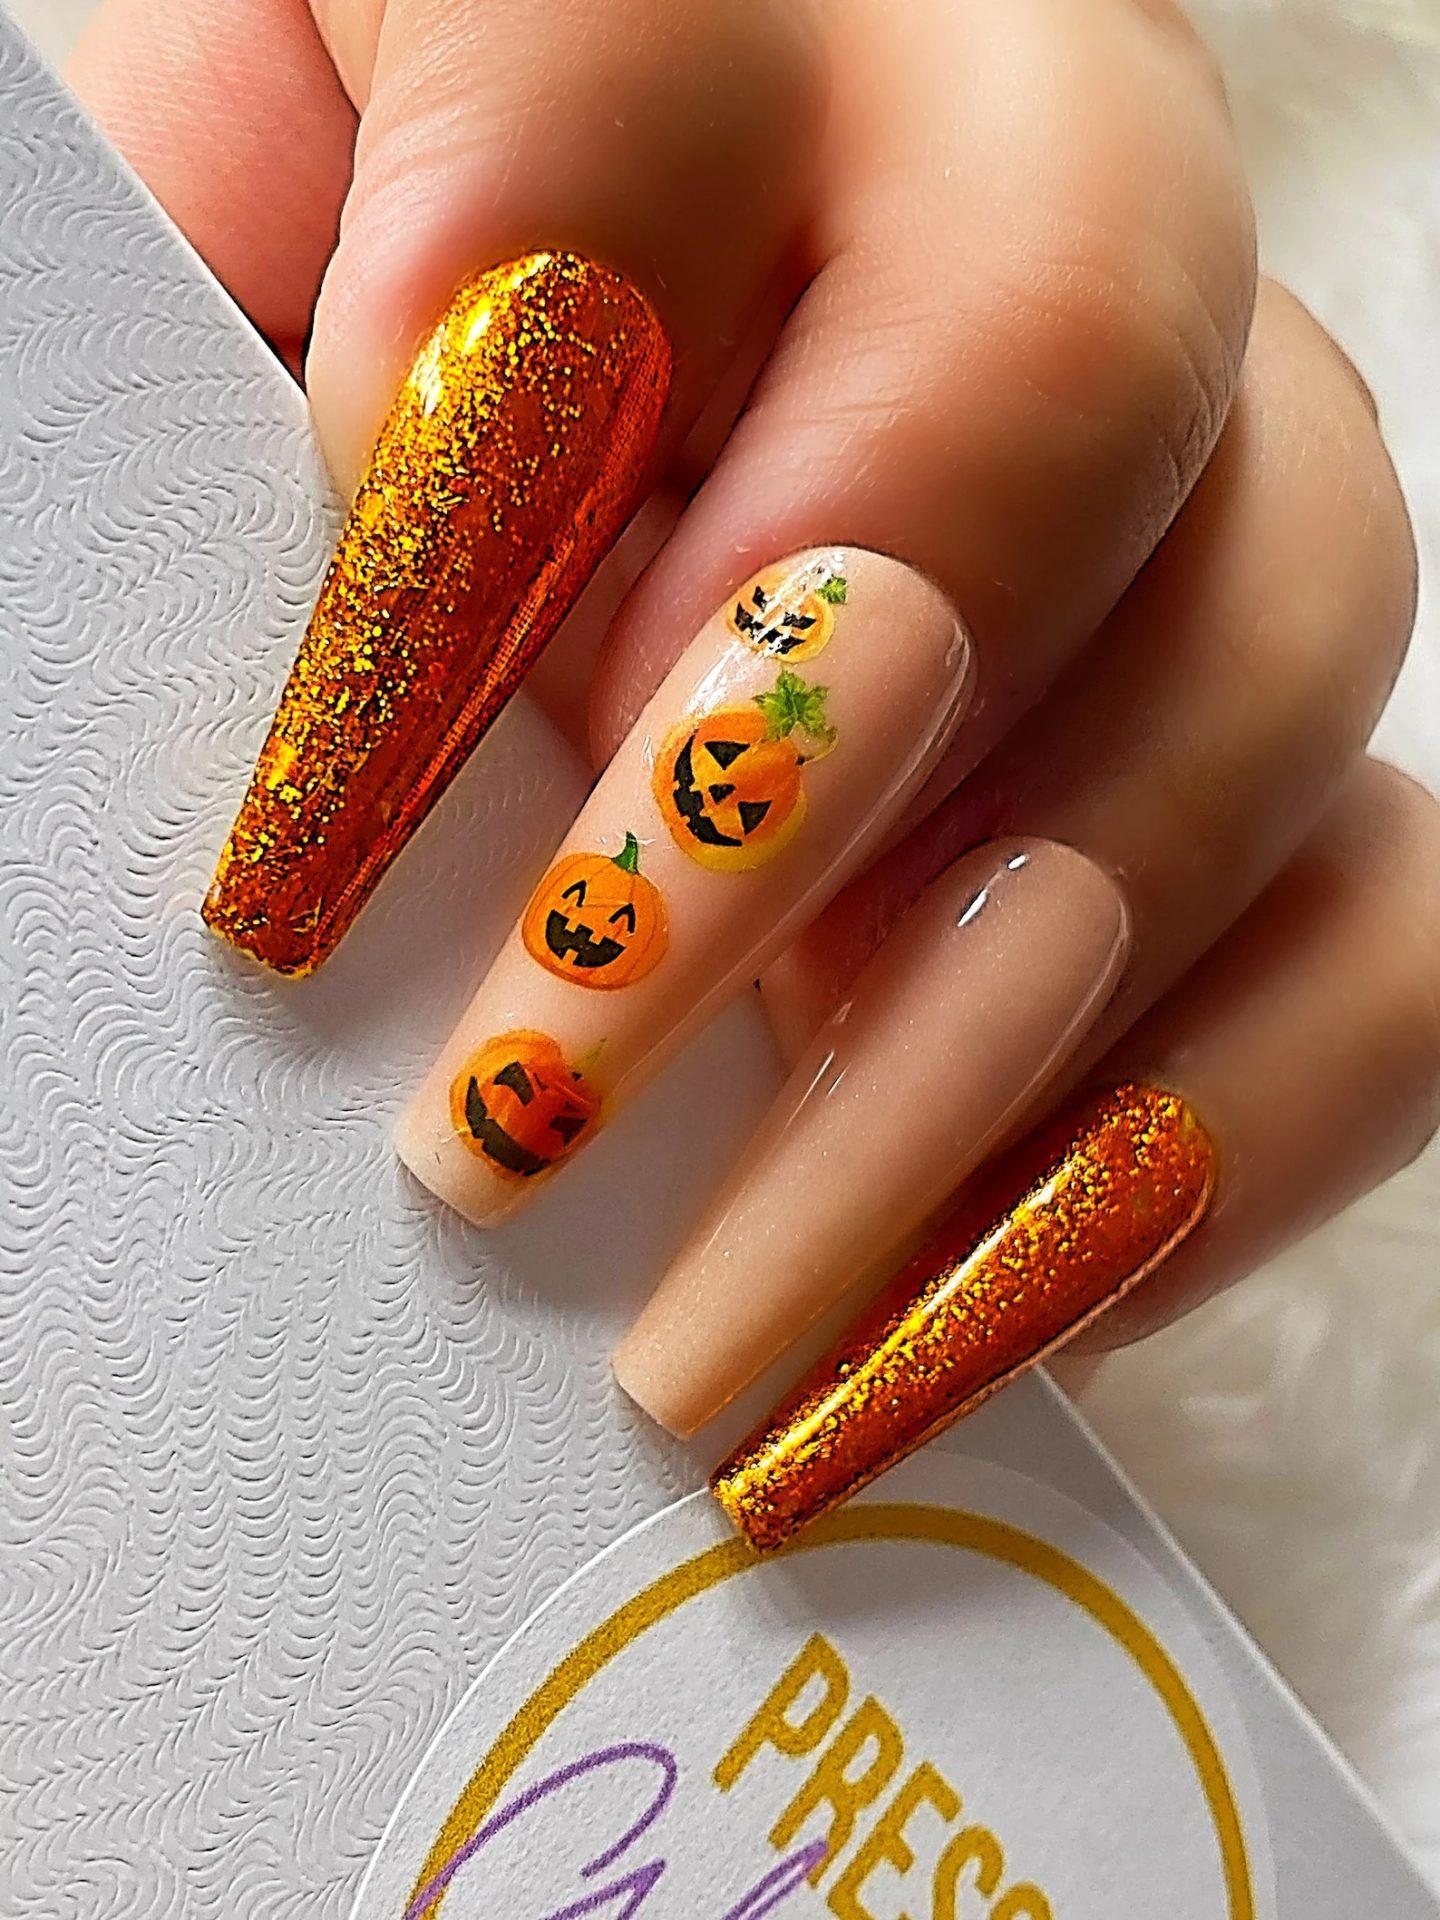 Burnt orange glitter nails with Halloween pumpkins